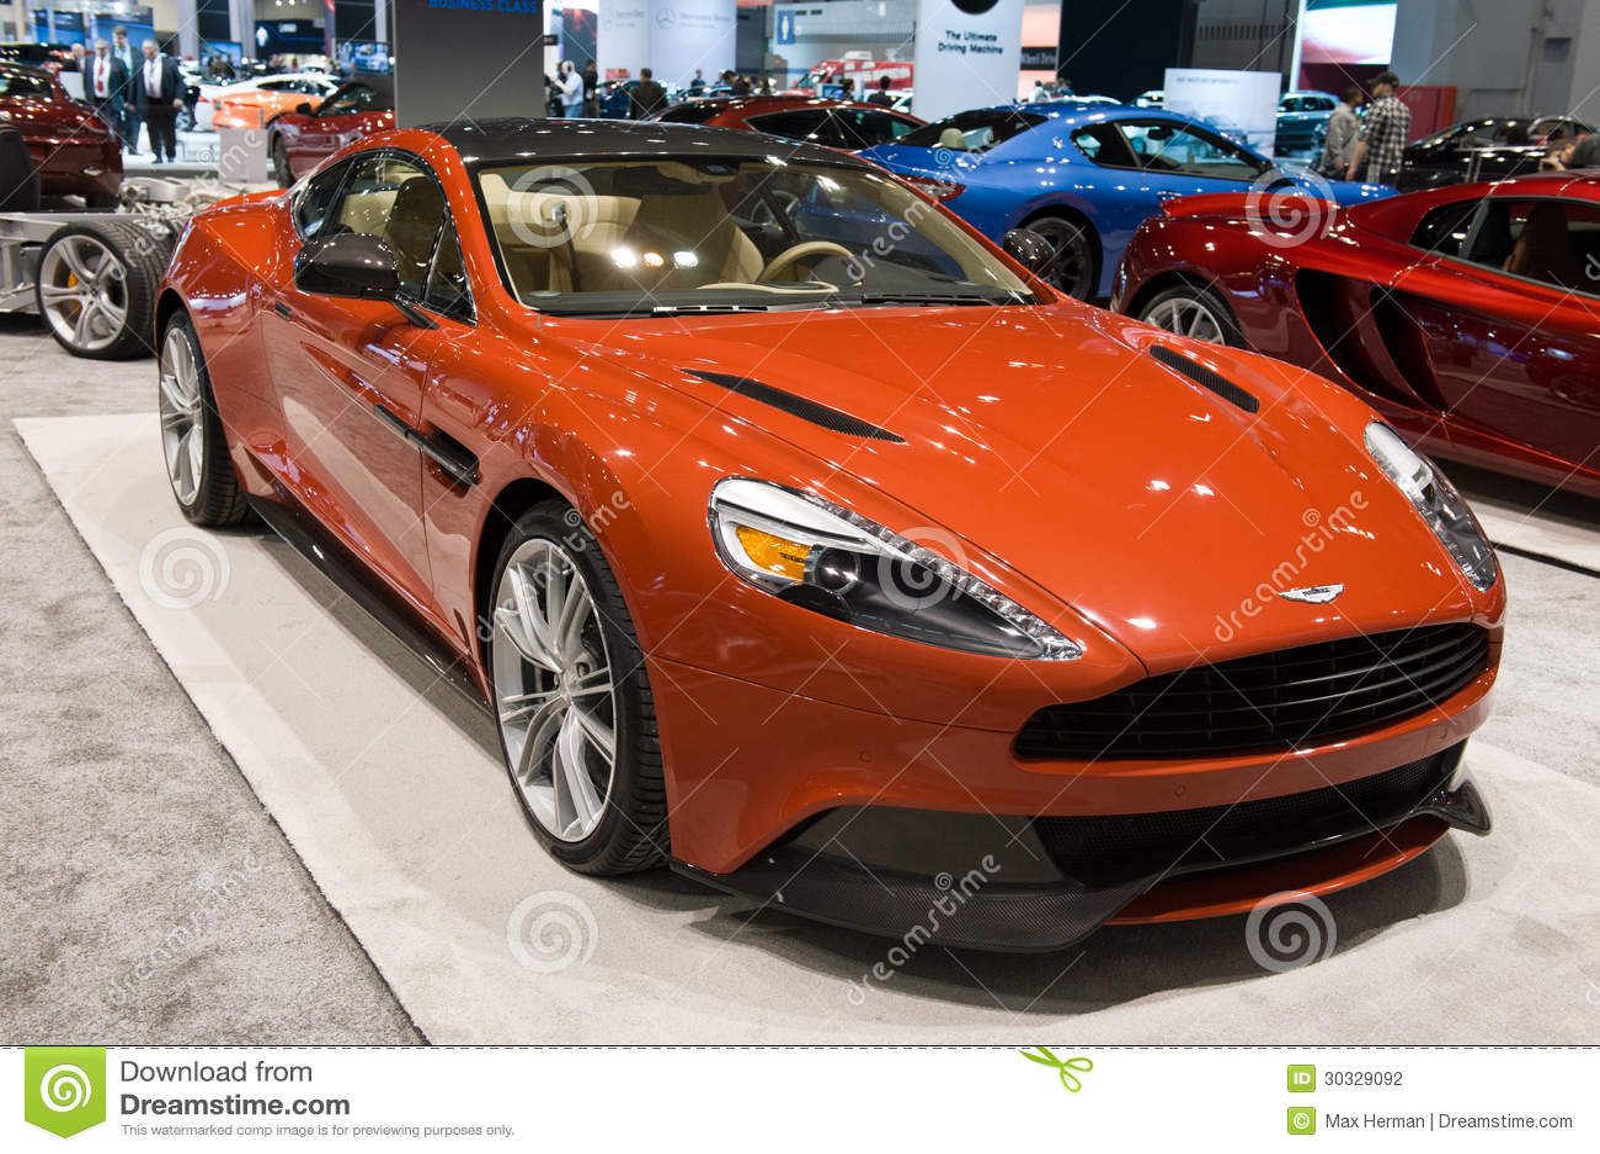 Aston Martin At The Chicago Auto Show Editorial Photography Image - Aston martin chicago